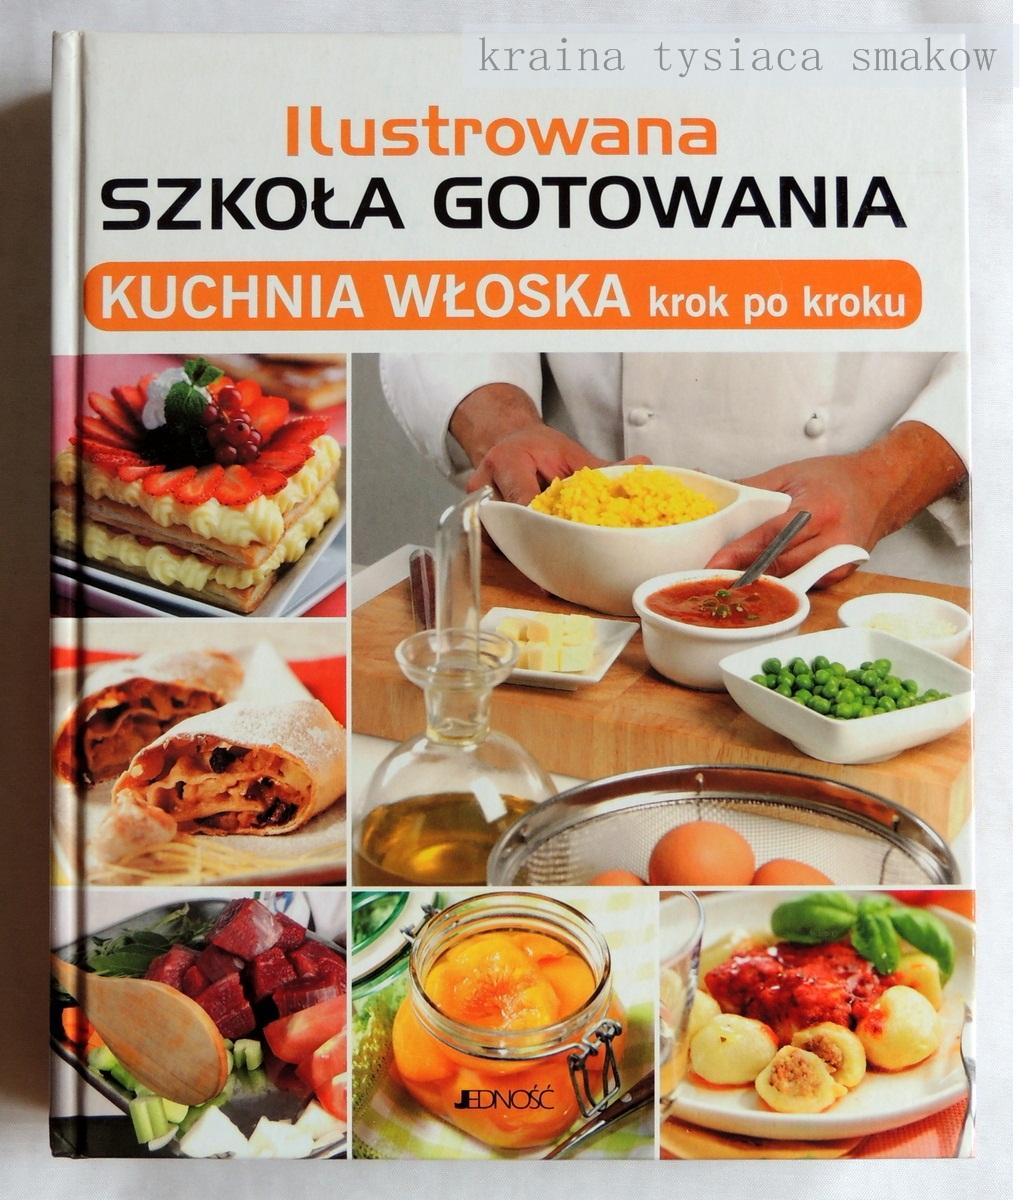 Kraina Tysiaca Smakow Ilustrowana Szkola Gotowania Kuchnia Wloska